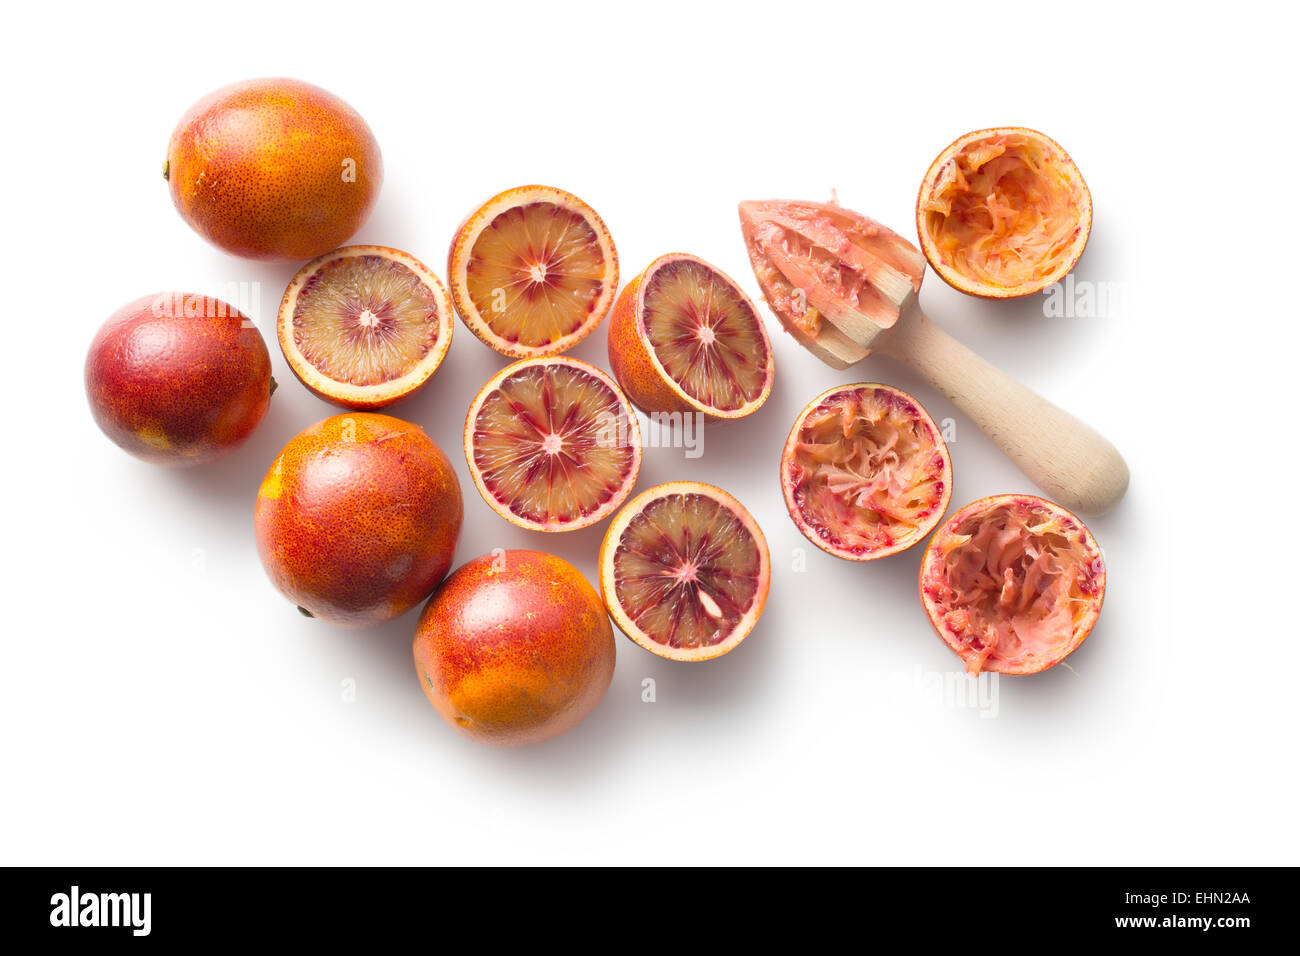 halved blood orange and juicer on white background - Stock Image